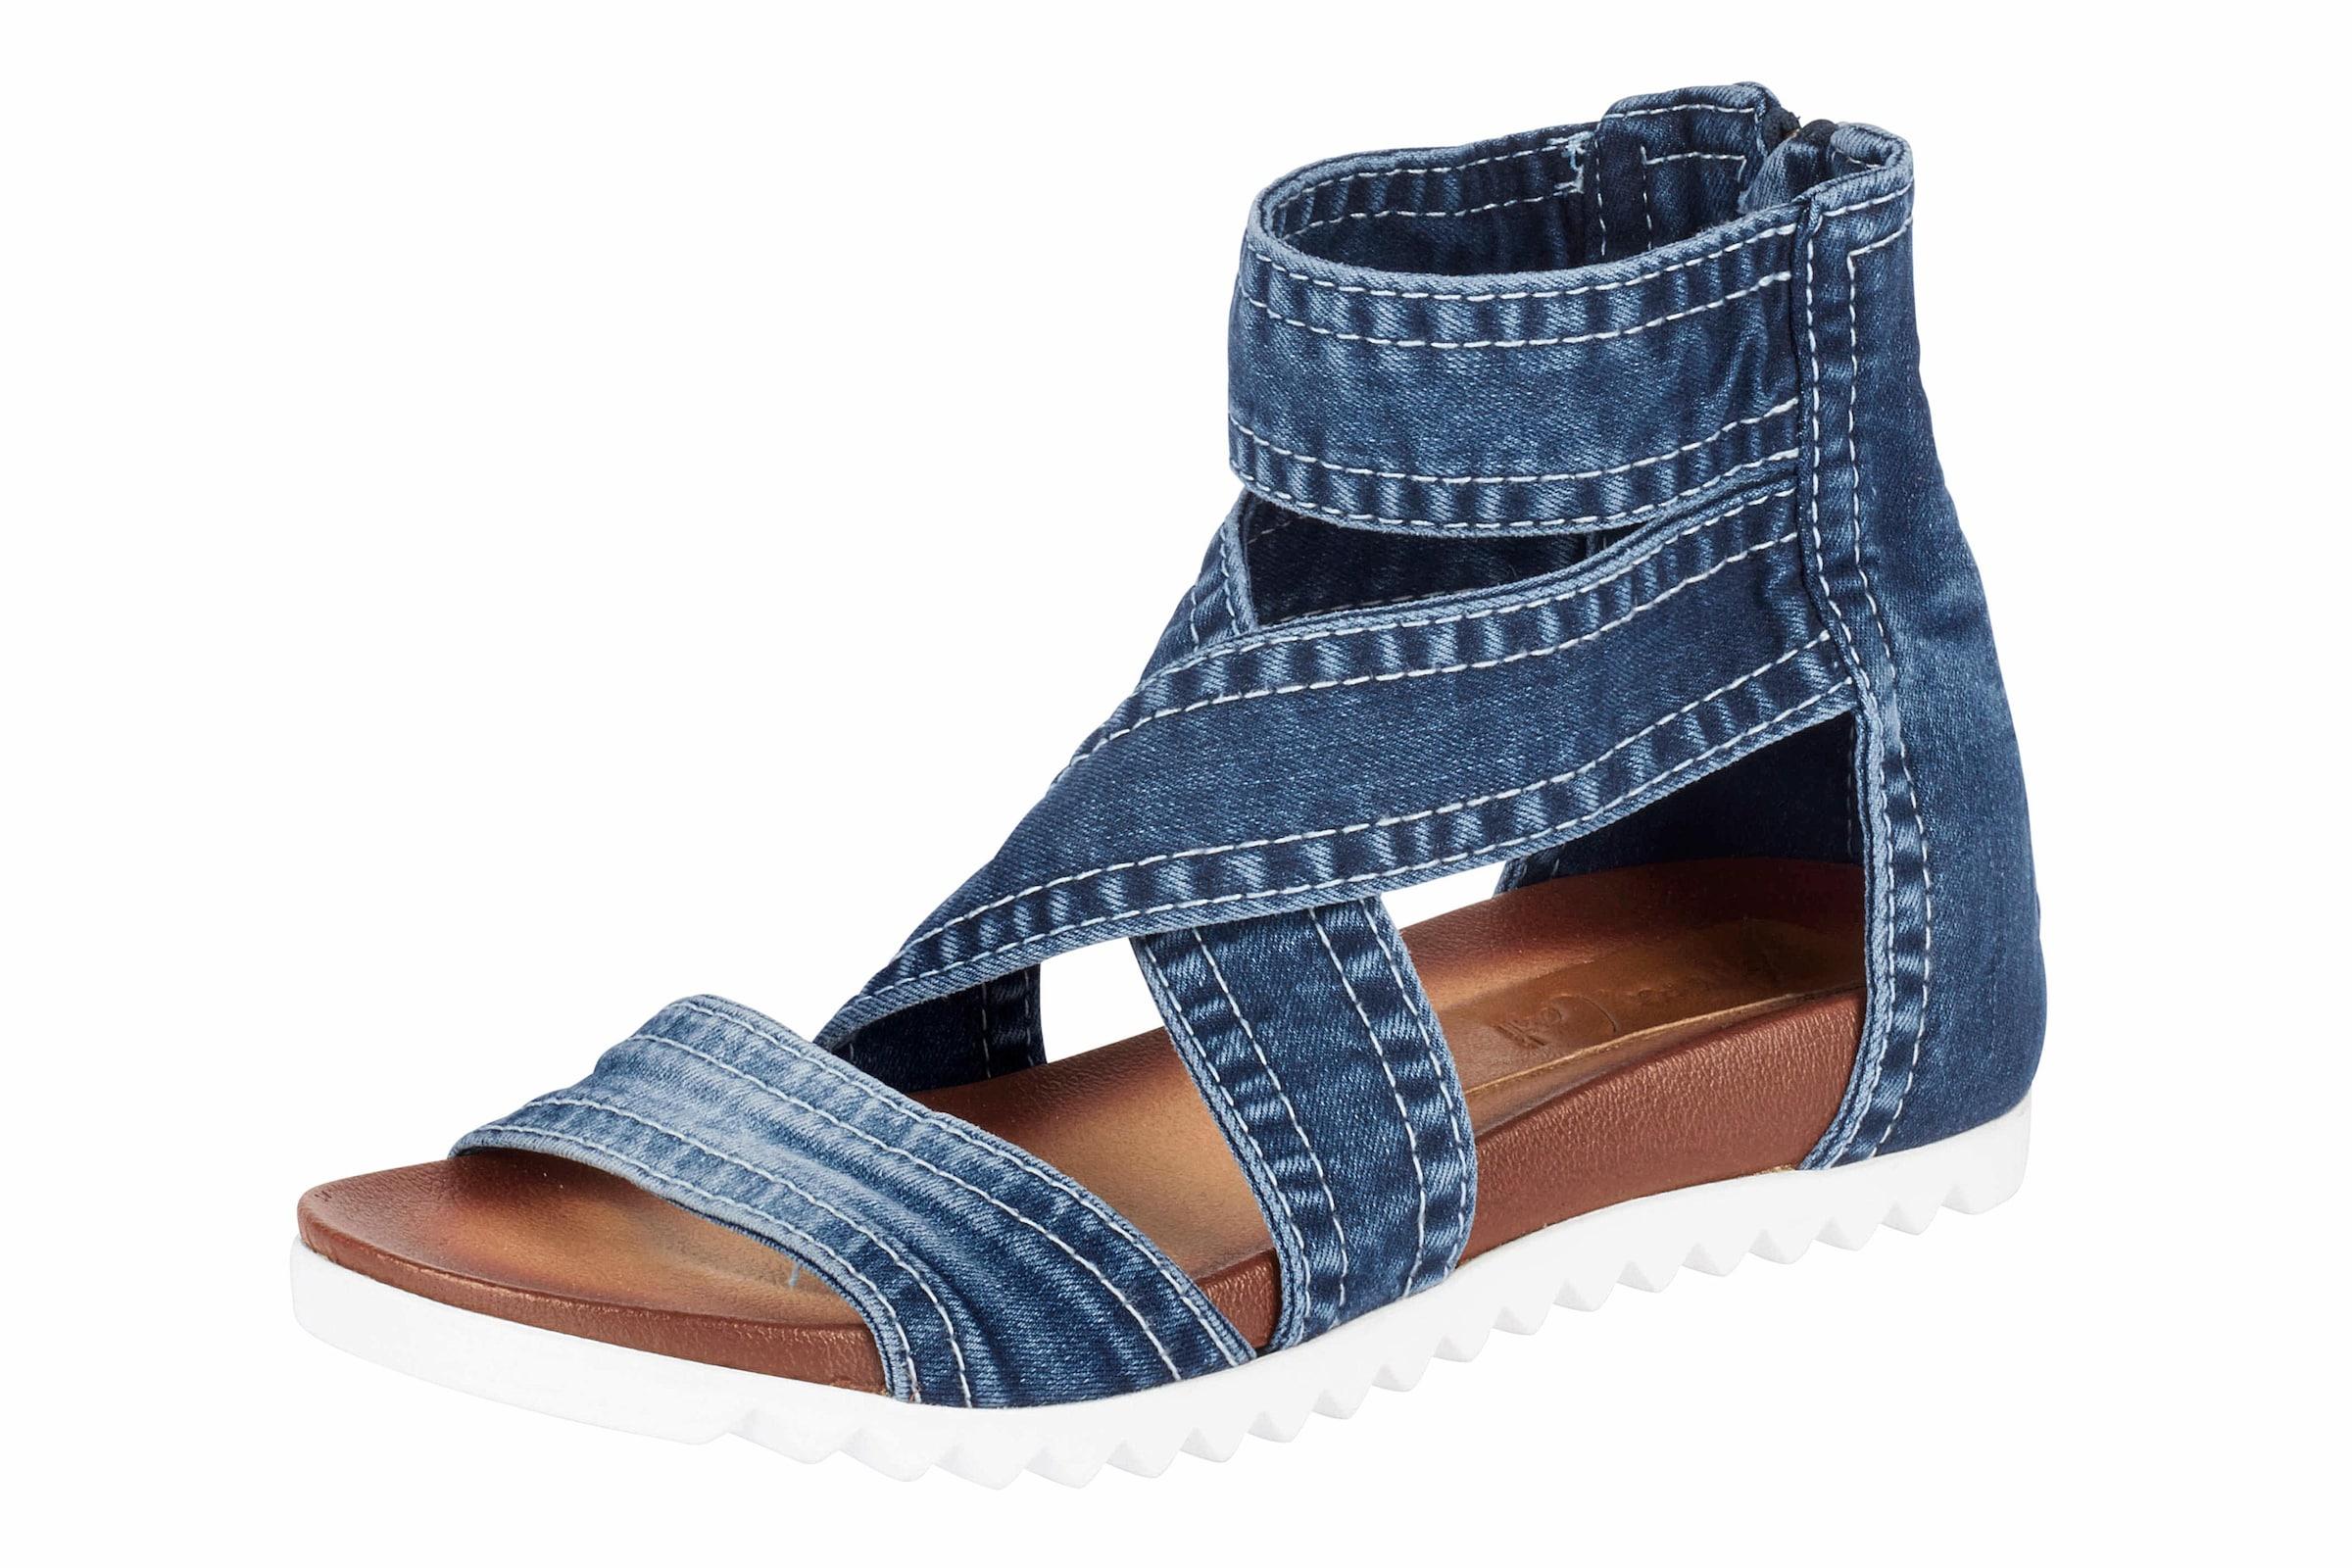 ANDREA CONTI | Sandalette im Denim-Look Schuhe Gut getragene Schuhe